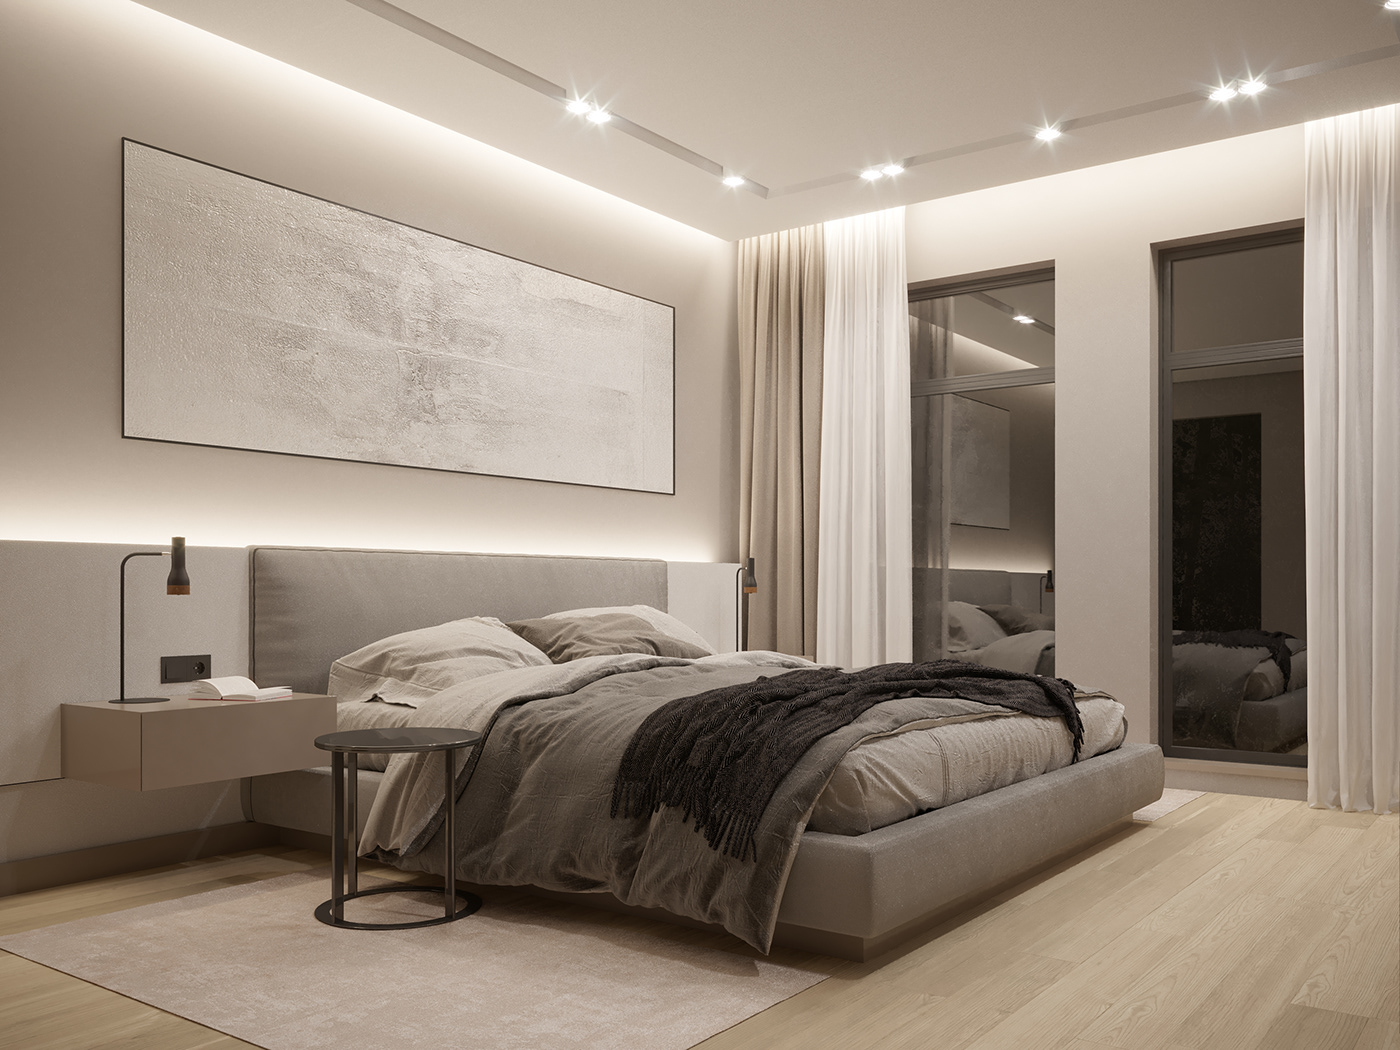 Minimalist bedroom | Interior Design on Behance